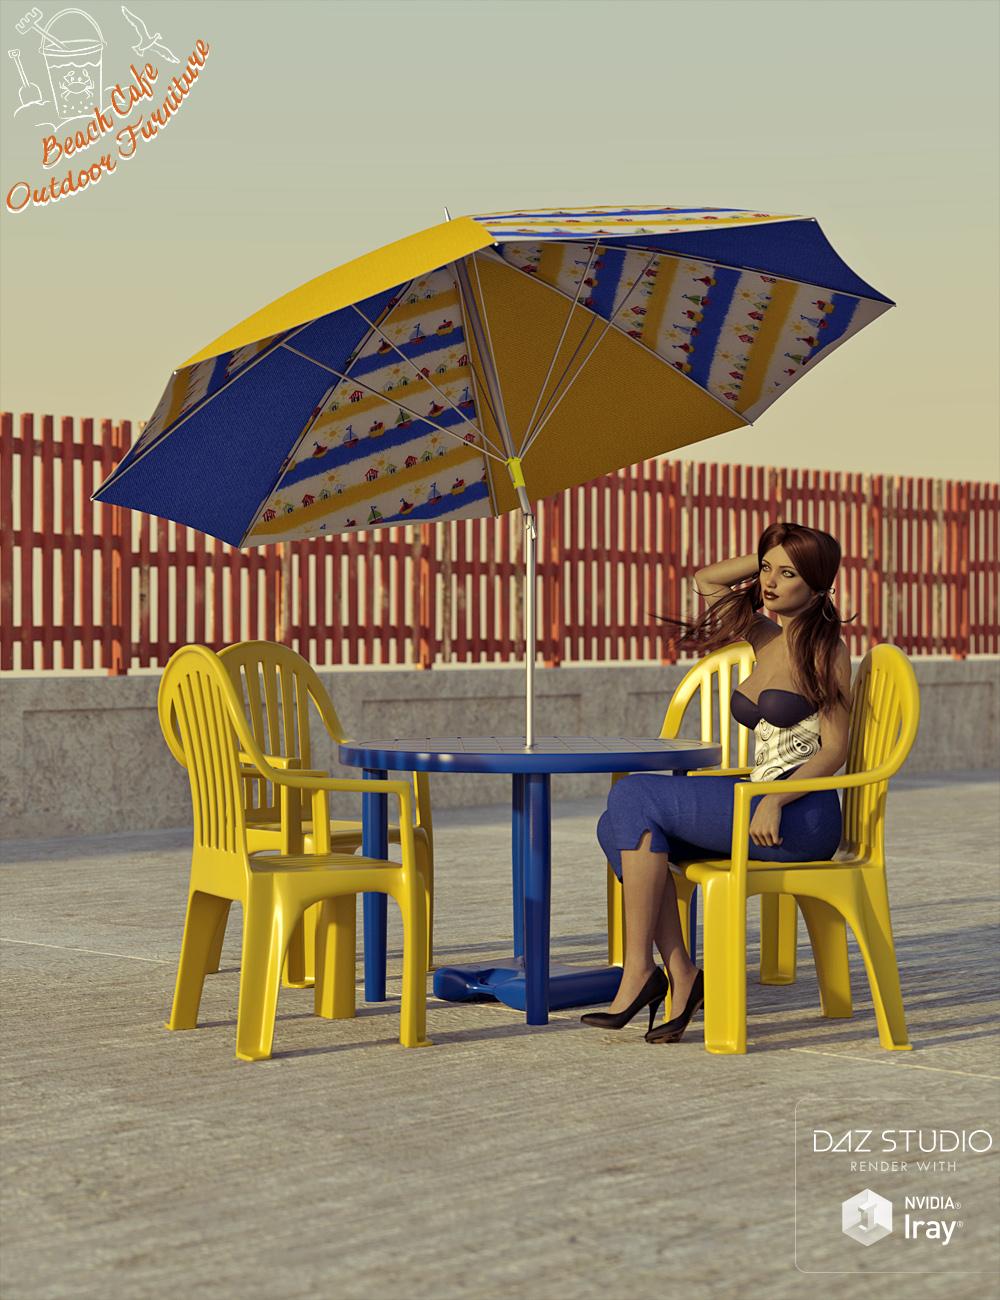 Beach Cafe Outdoor Furniture by: David BrinnenForbiddenWhispers, 3D Models by Daz 3D